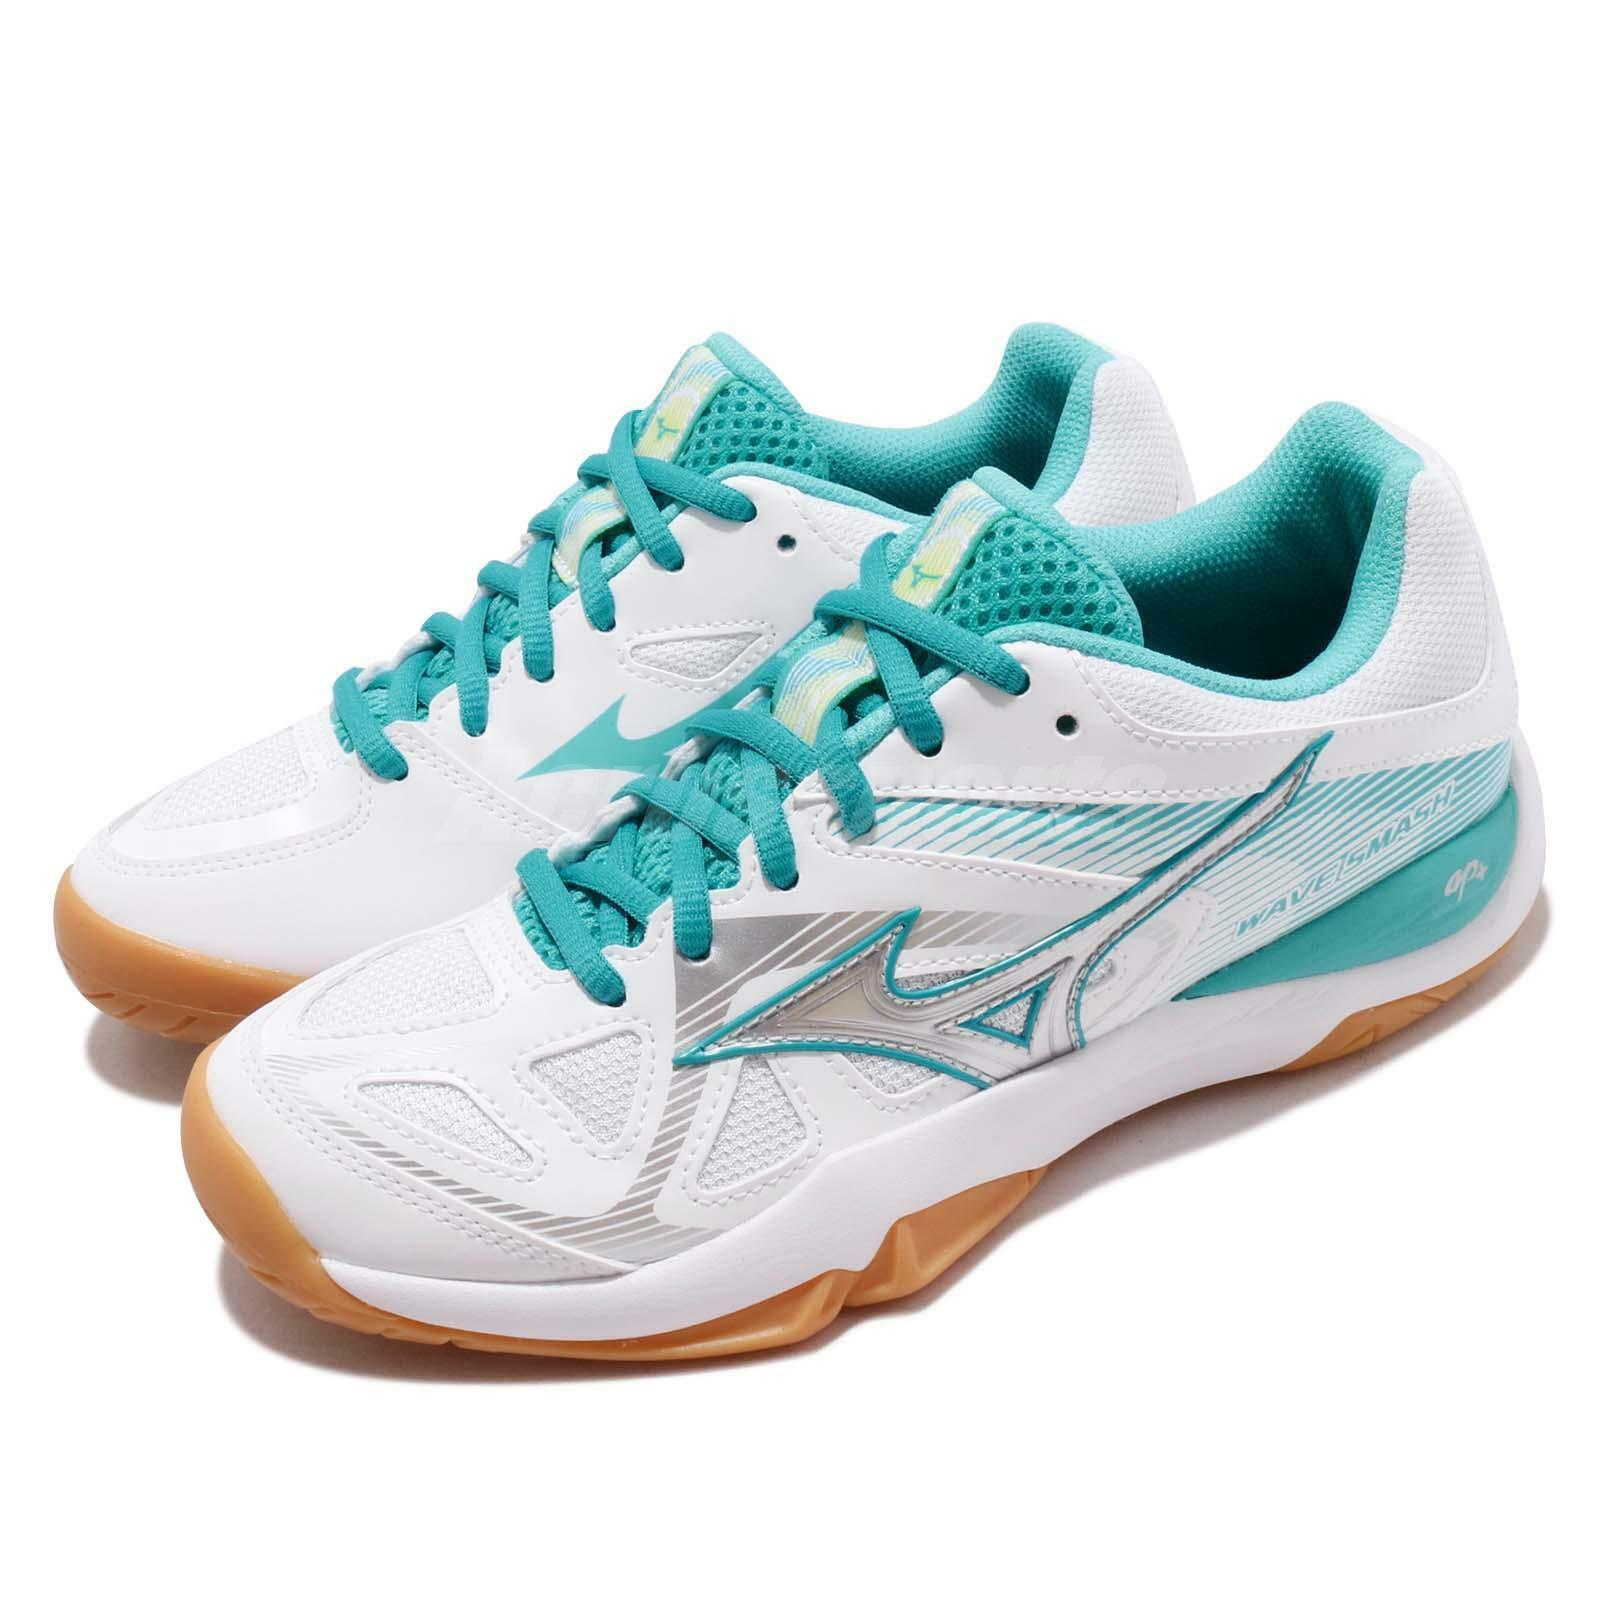 Mizuno Mizuno Mizuno Wave Smash 5 Goma verde blancoooo para Hombre Mujer Bádminton Zapatos 71GA1960-24 a81885